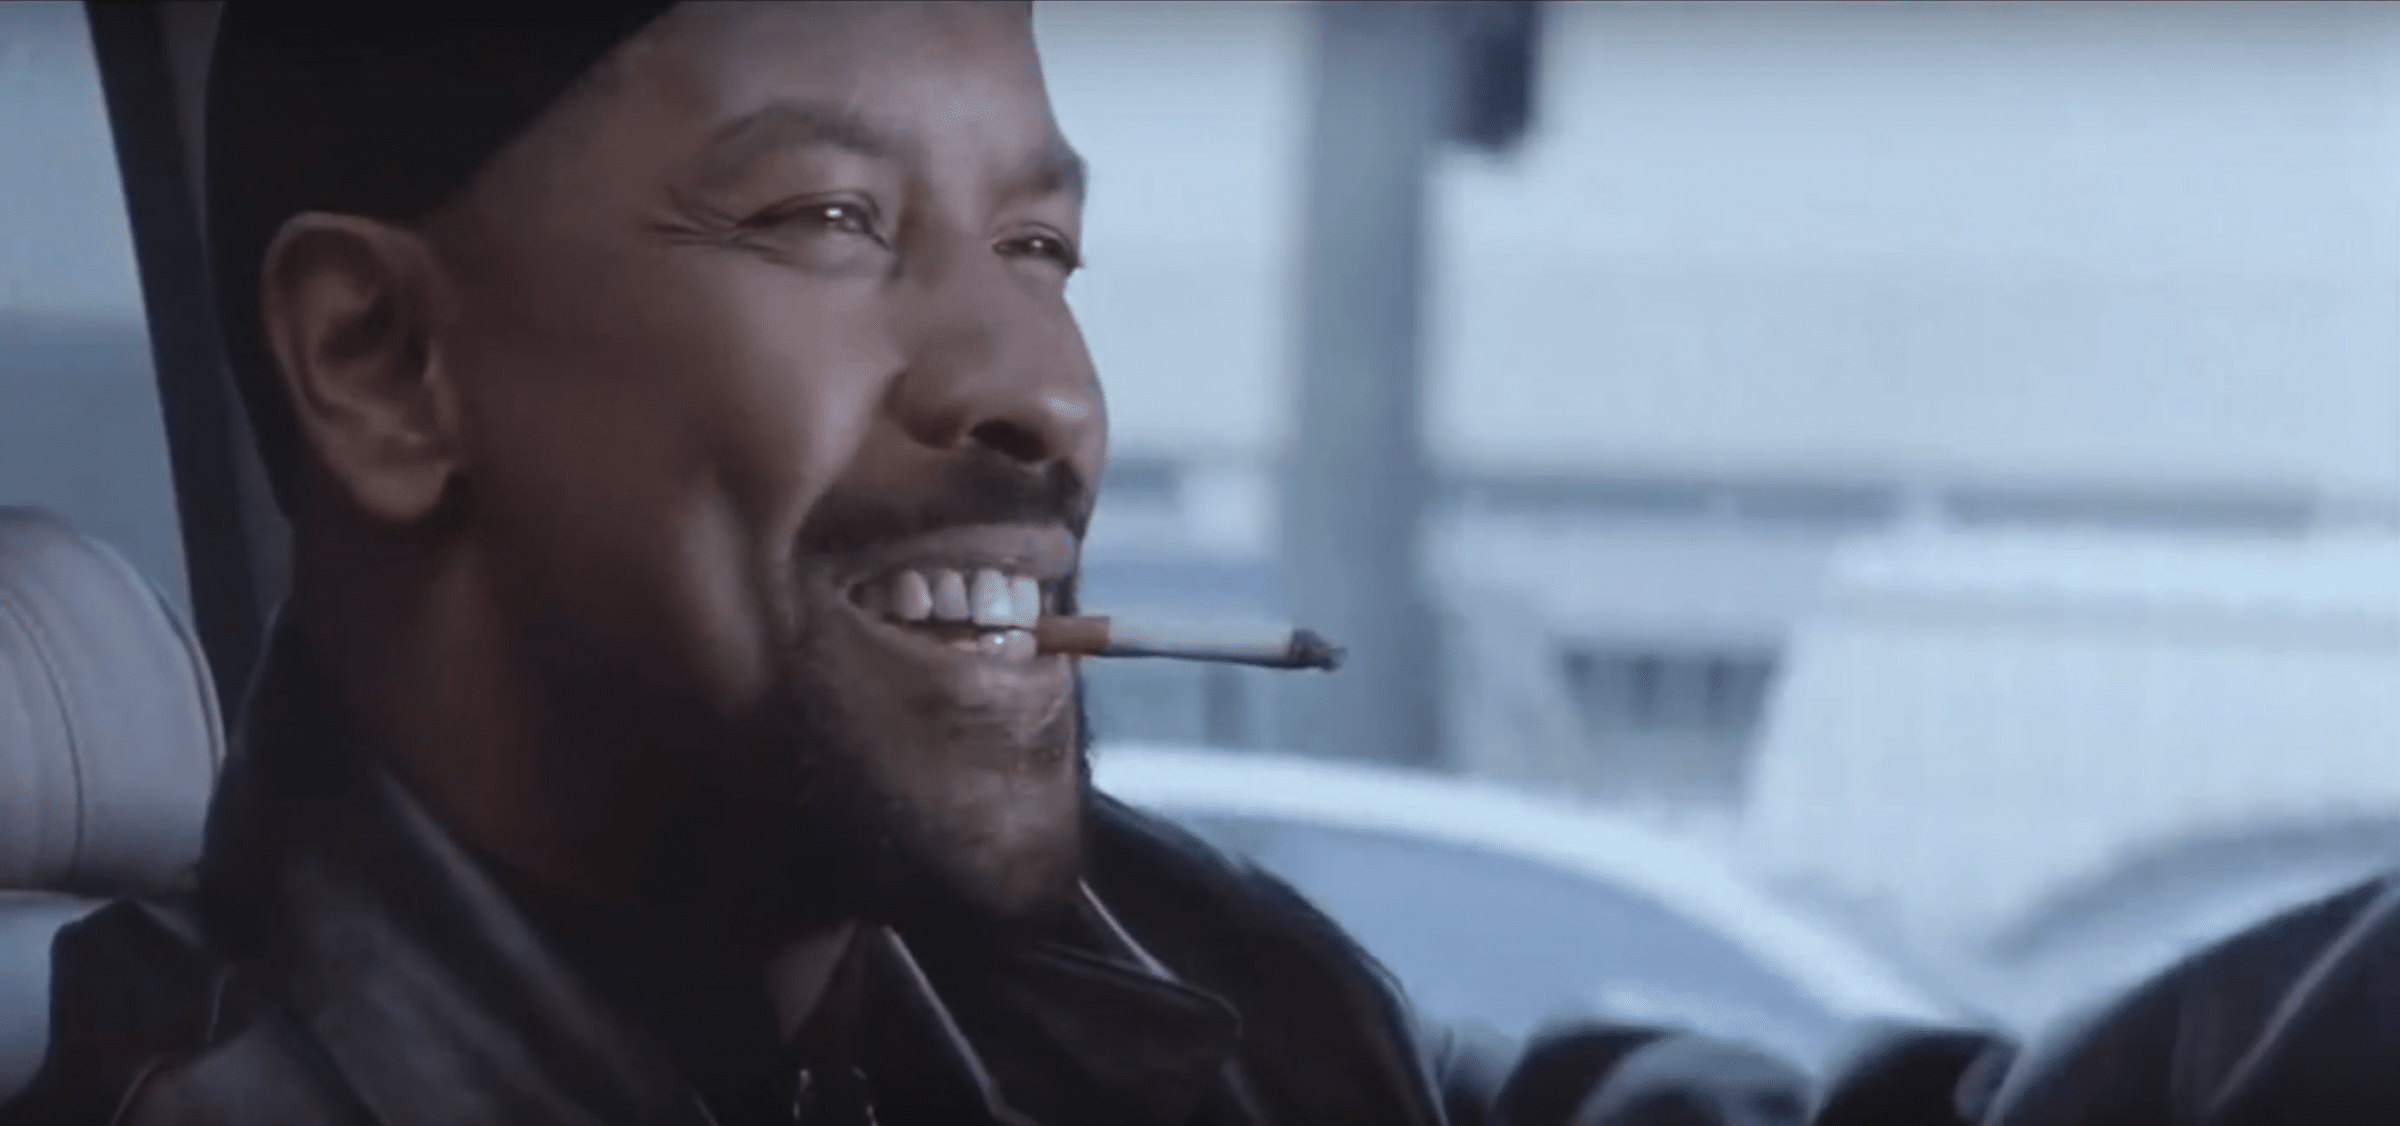 denzel cigarette mah meme template